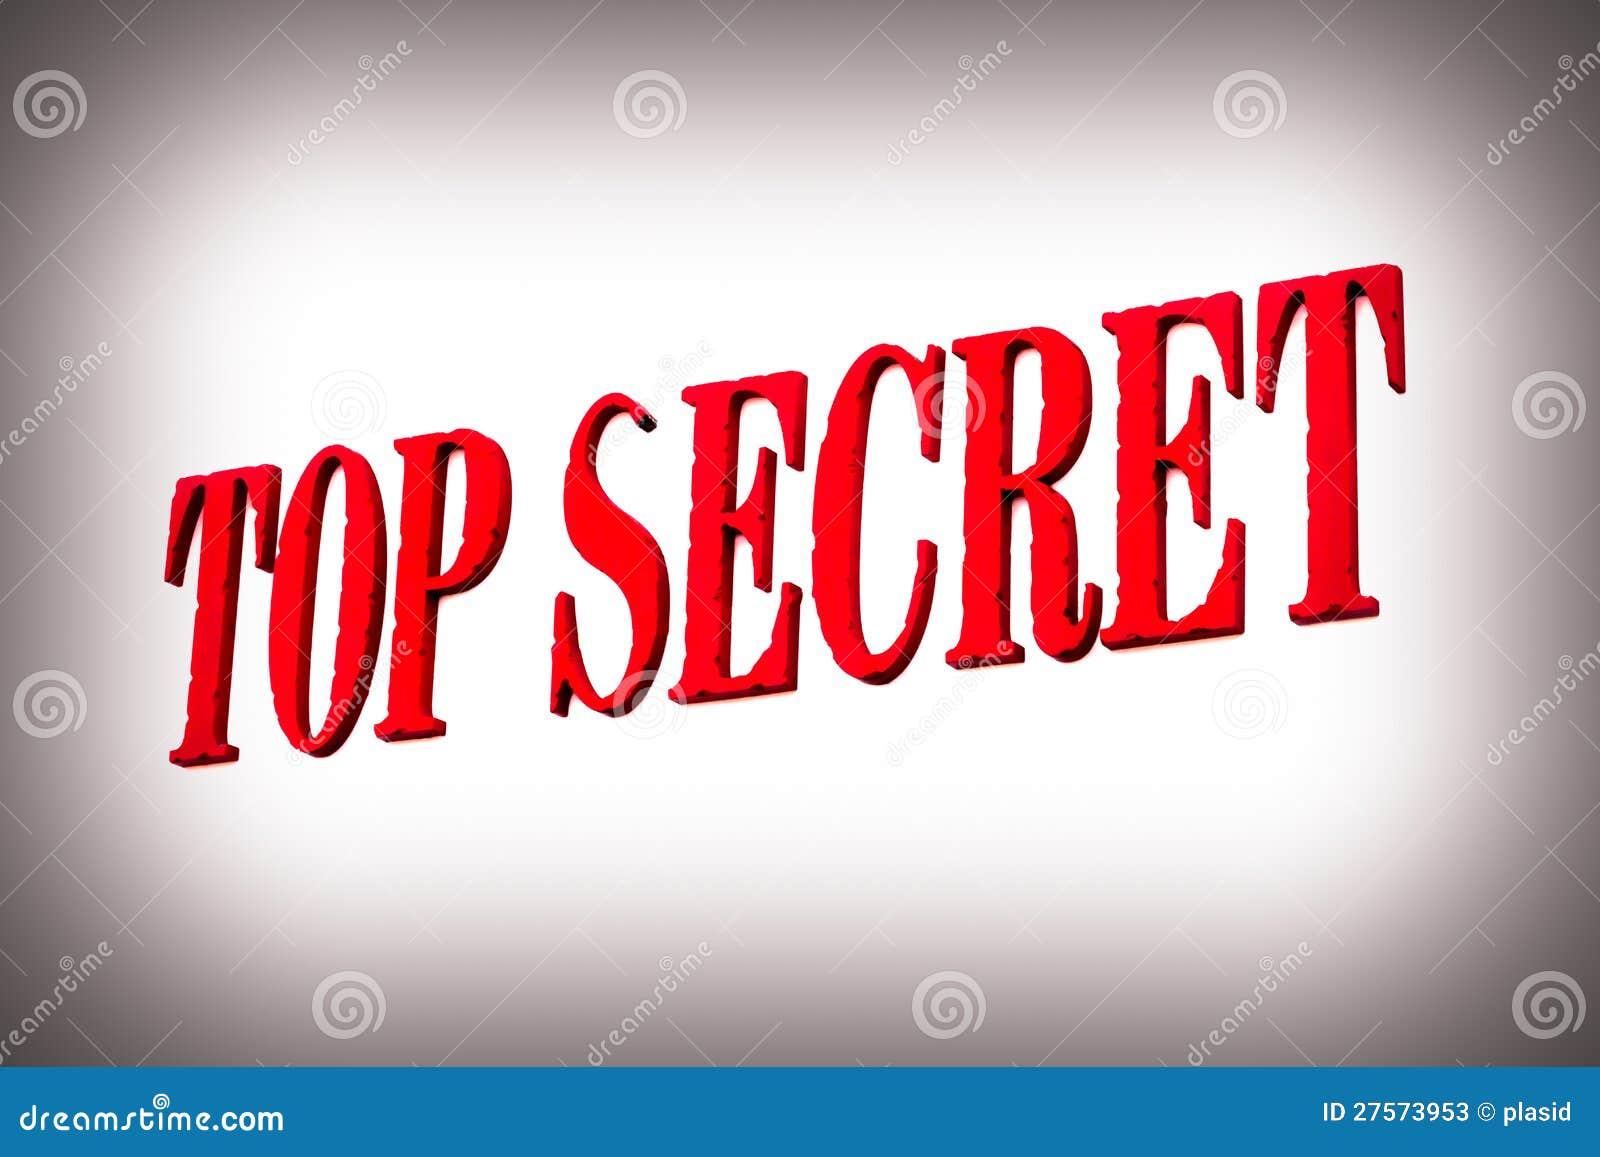 Red Top Secret Sign Stock Photos - Image: 27573953